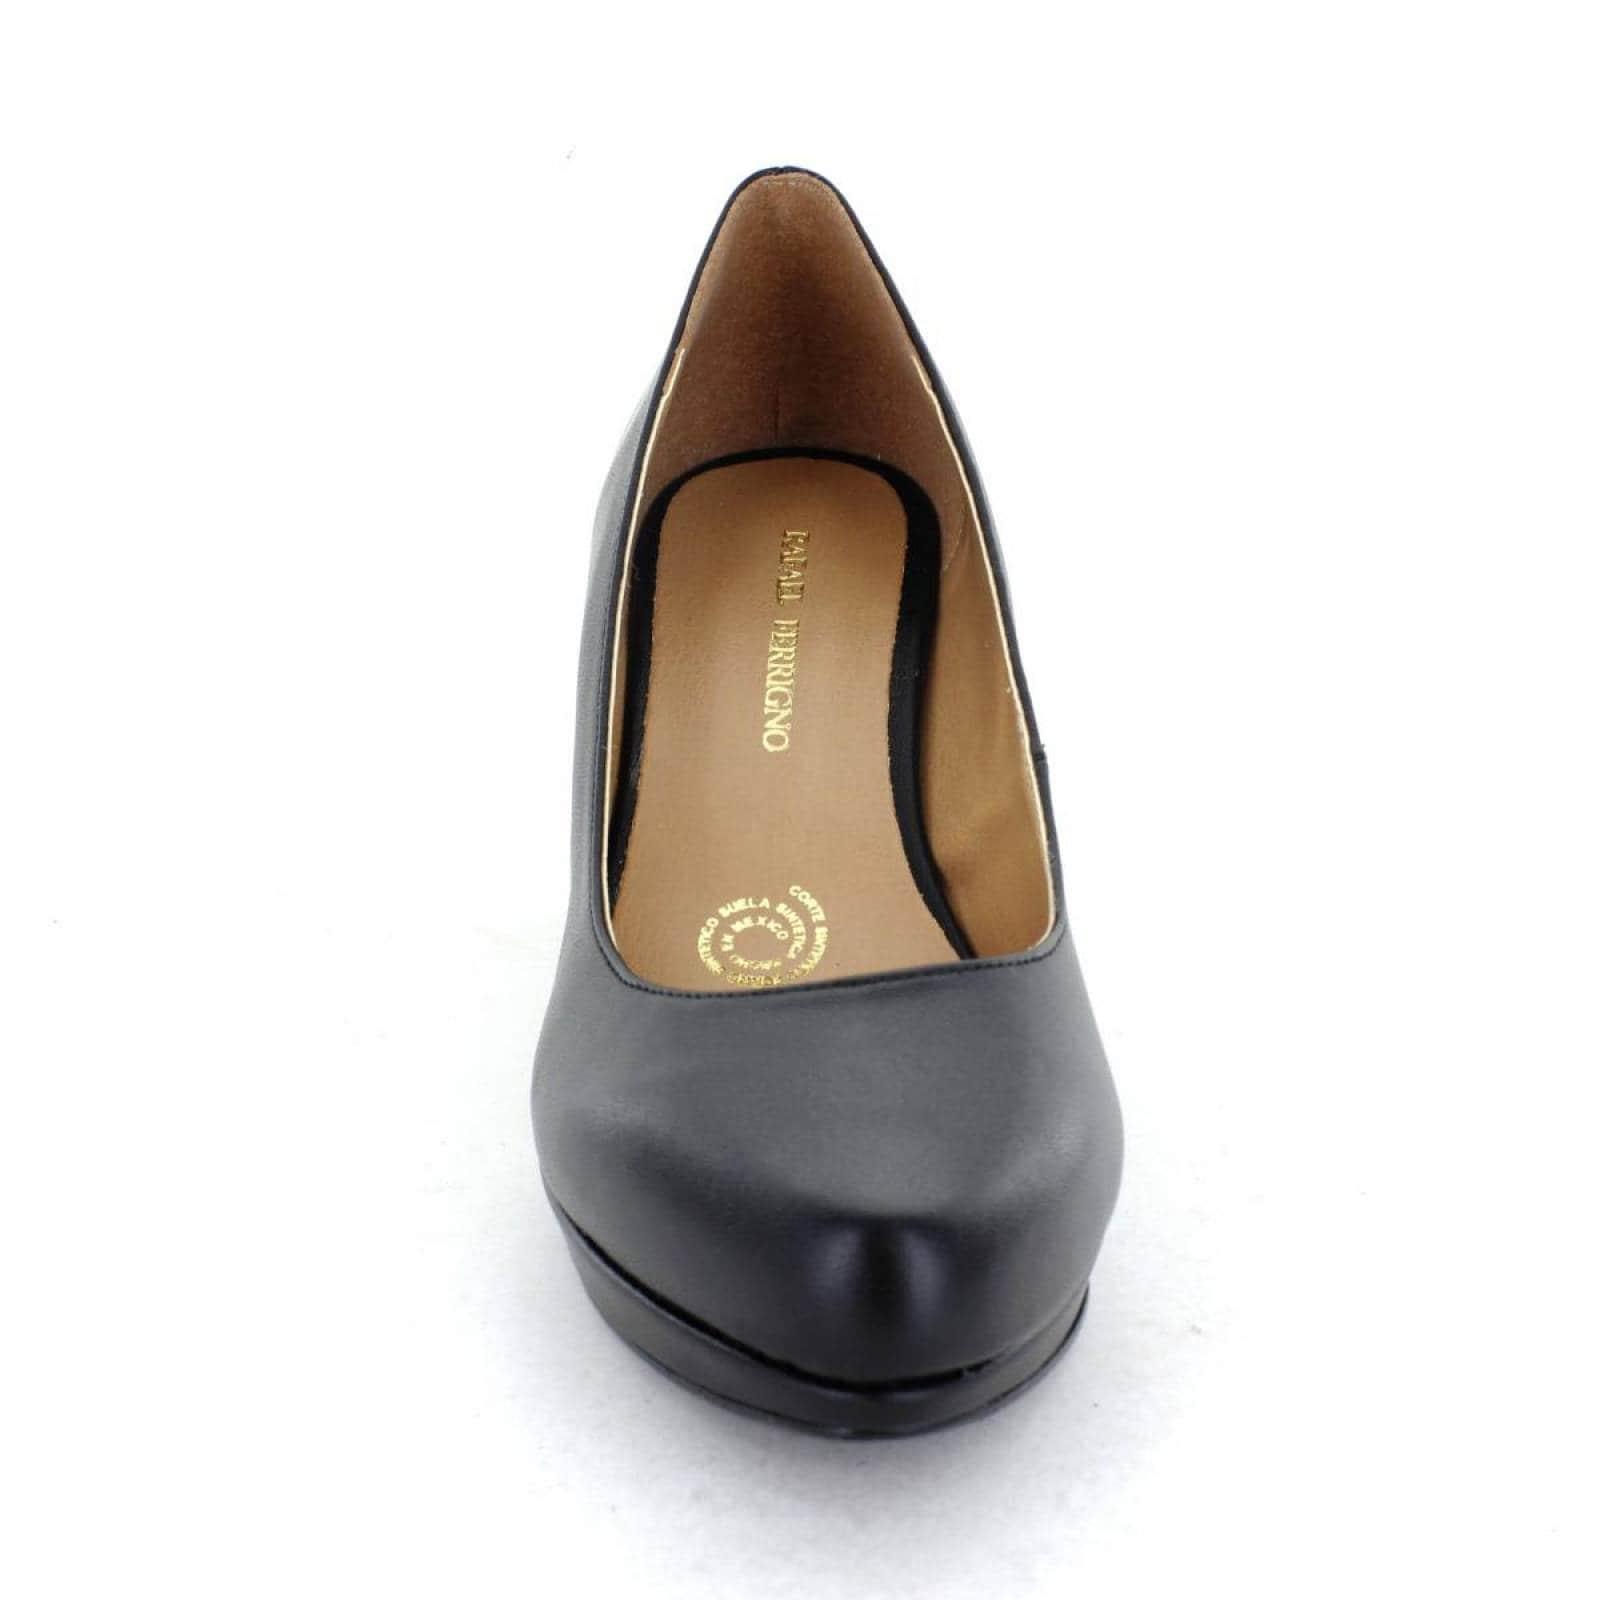 Zapatilla para Mujer Rafael Ferrigno 6651 027091 Color Negro